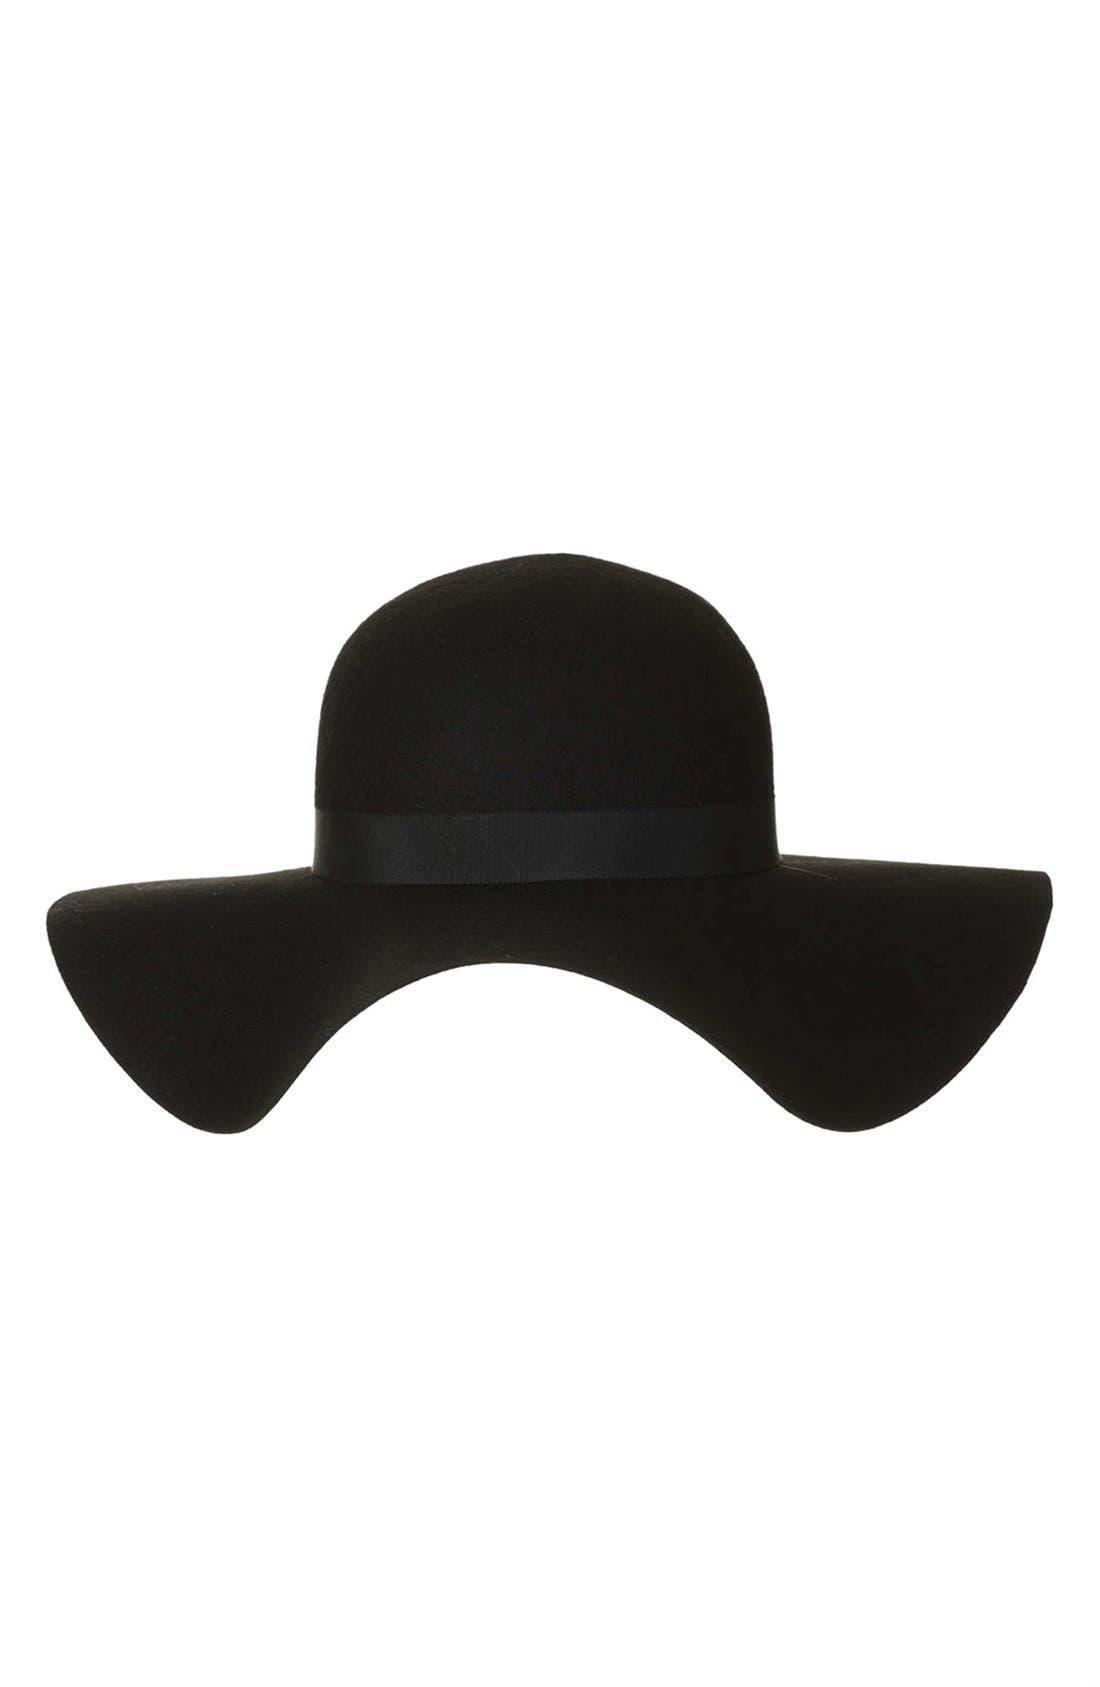 Floppy Wool Felt Hat,                             Alternate thumbnail 2, color,                             001